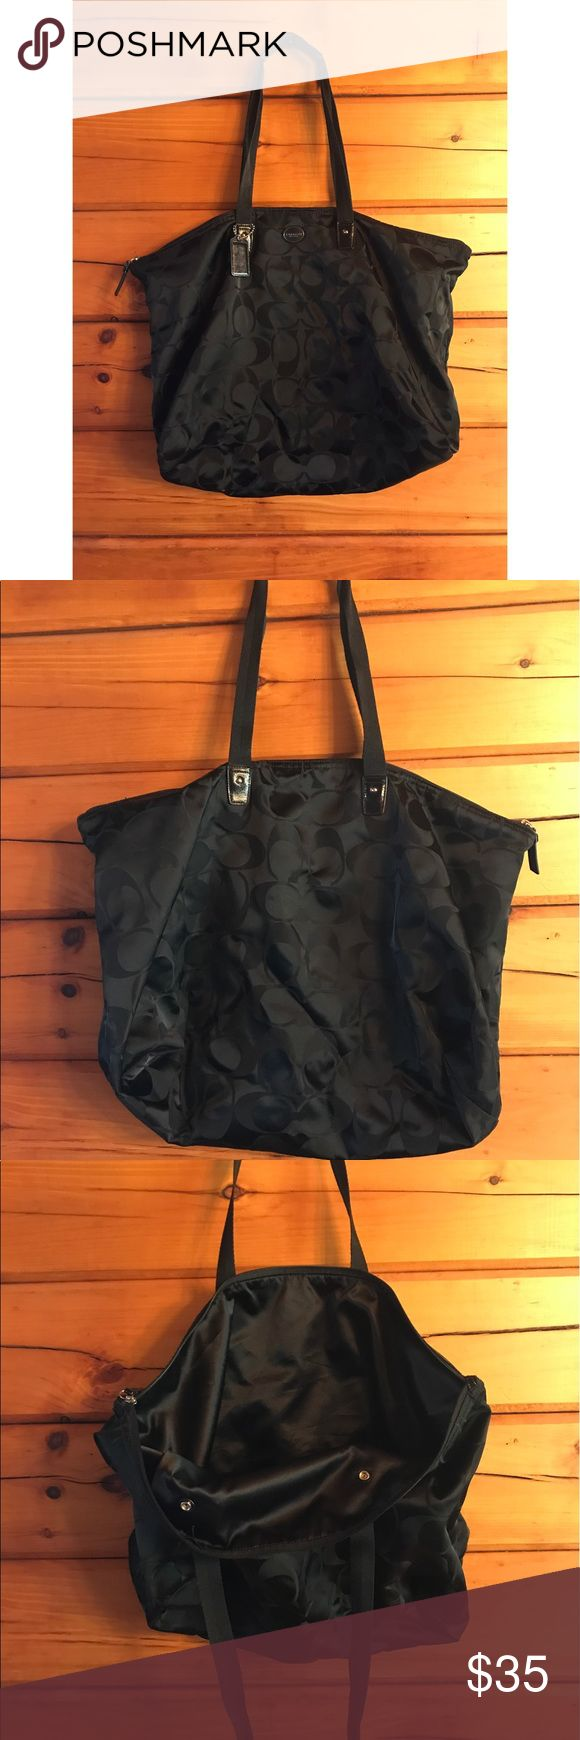 designer coach bags 8wi1  EUC Coach Travel Tote